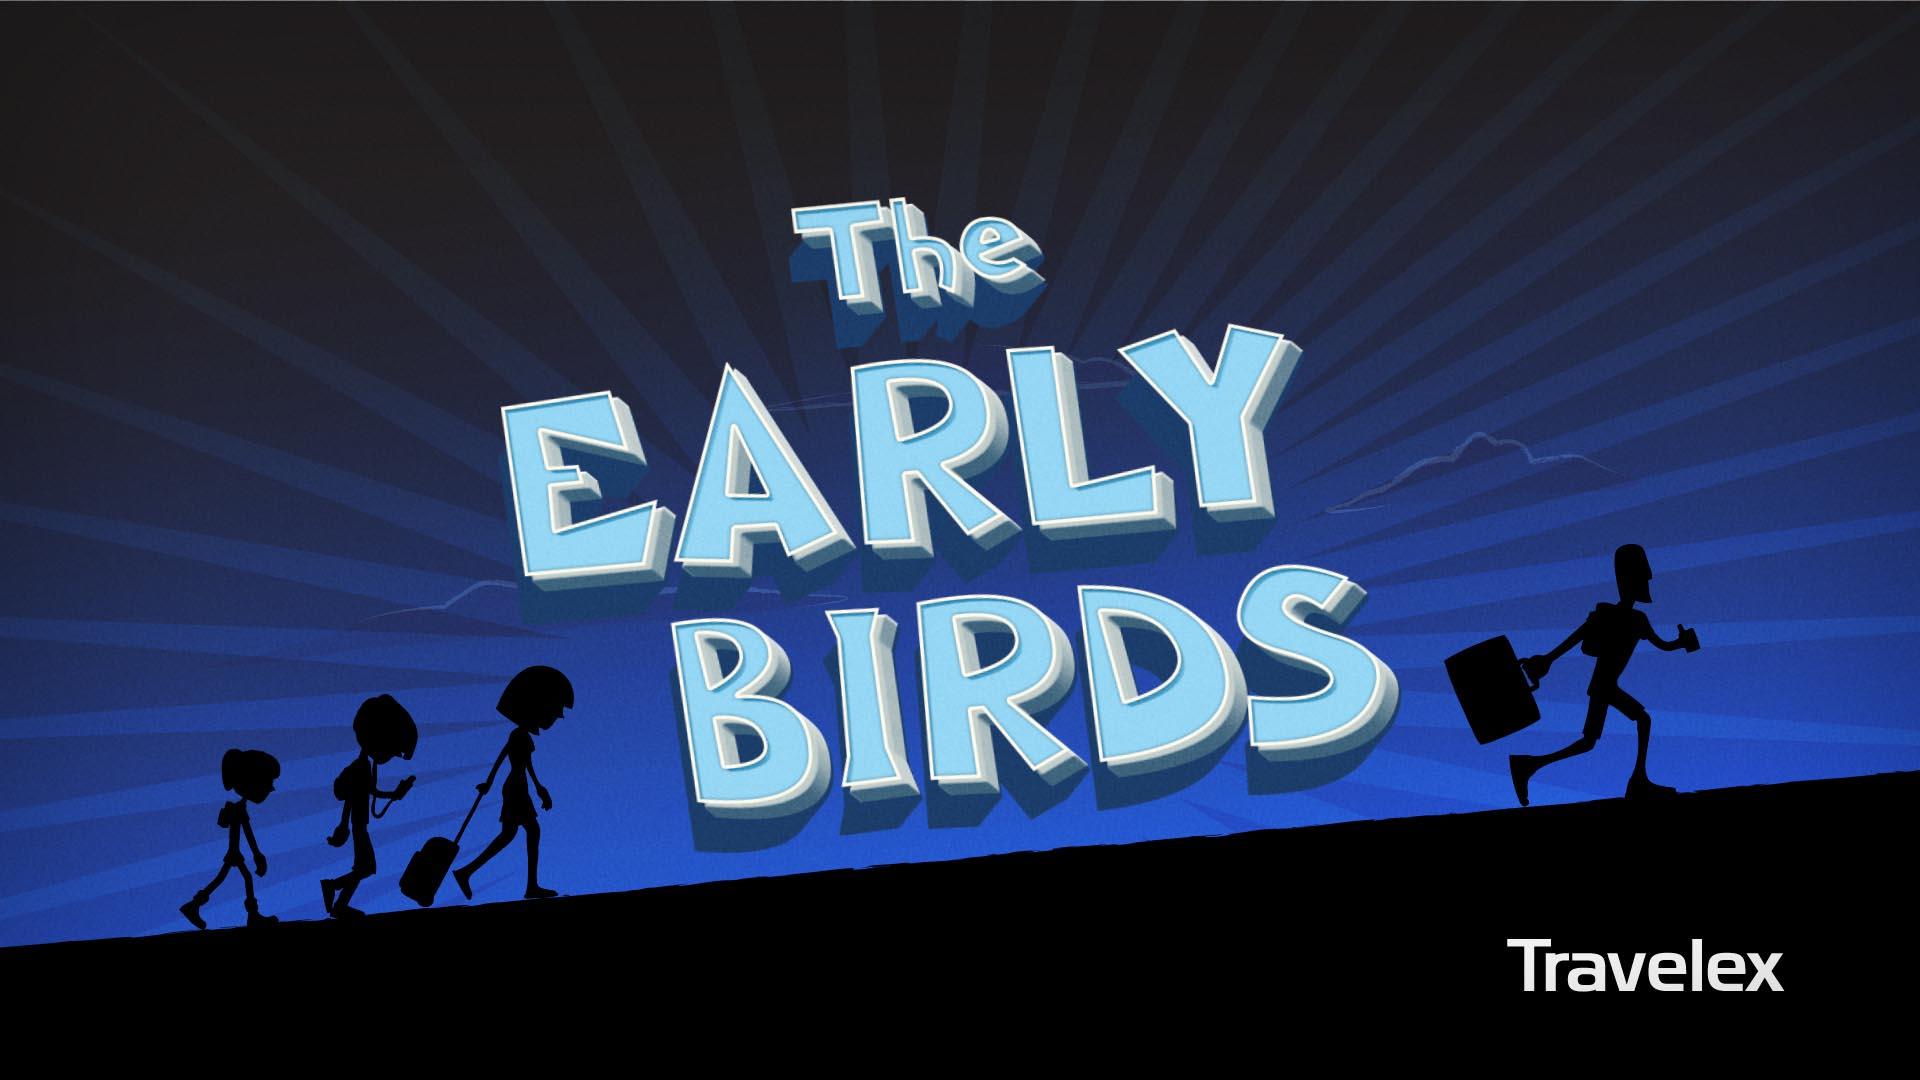 Travelex - The Early Birds - Title.jpg